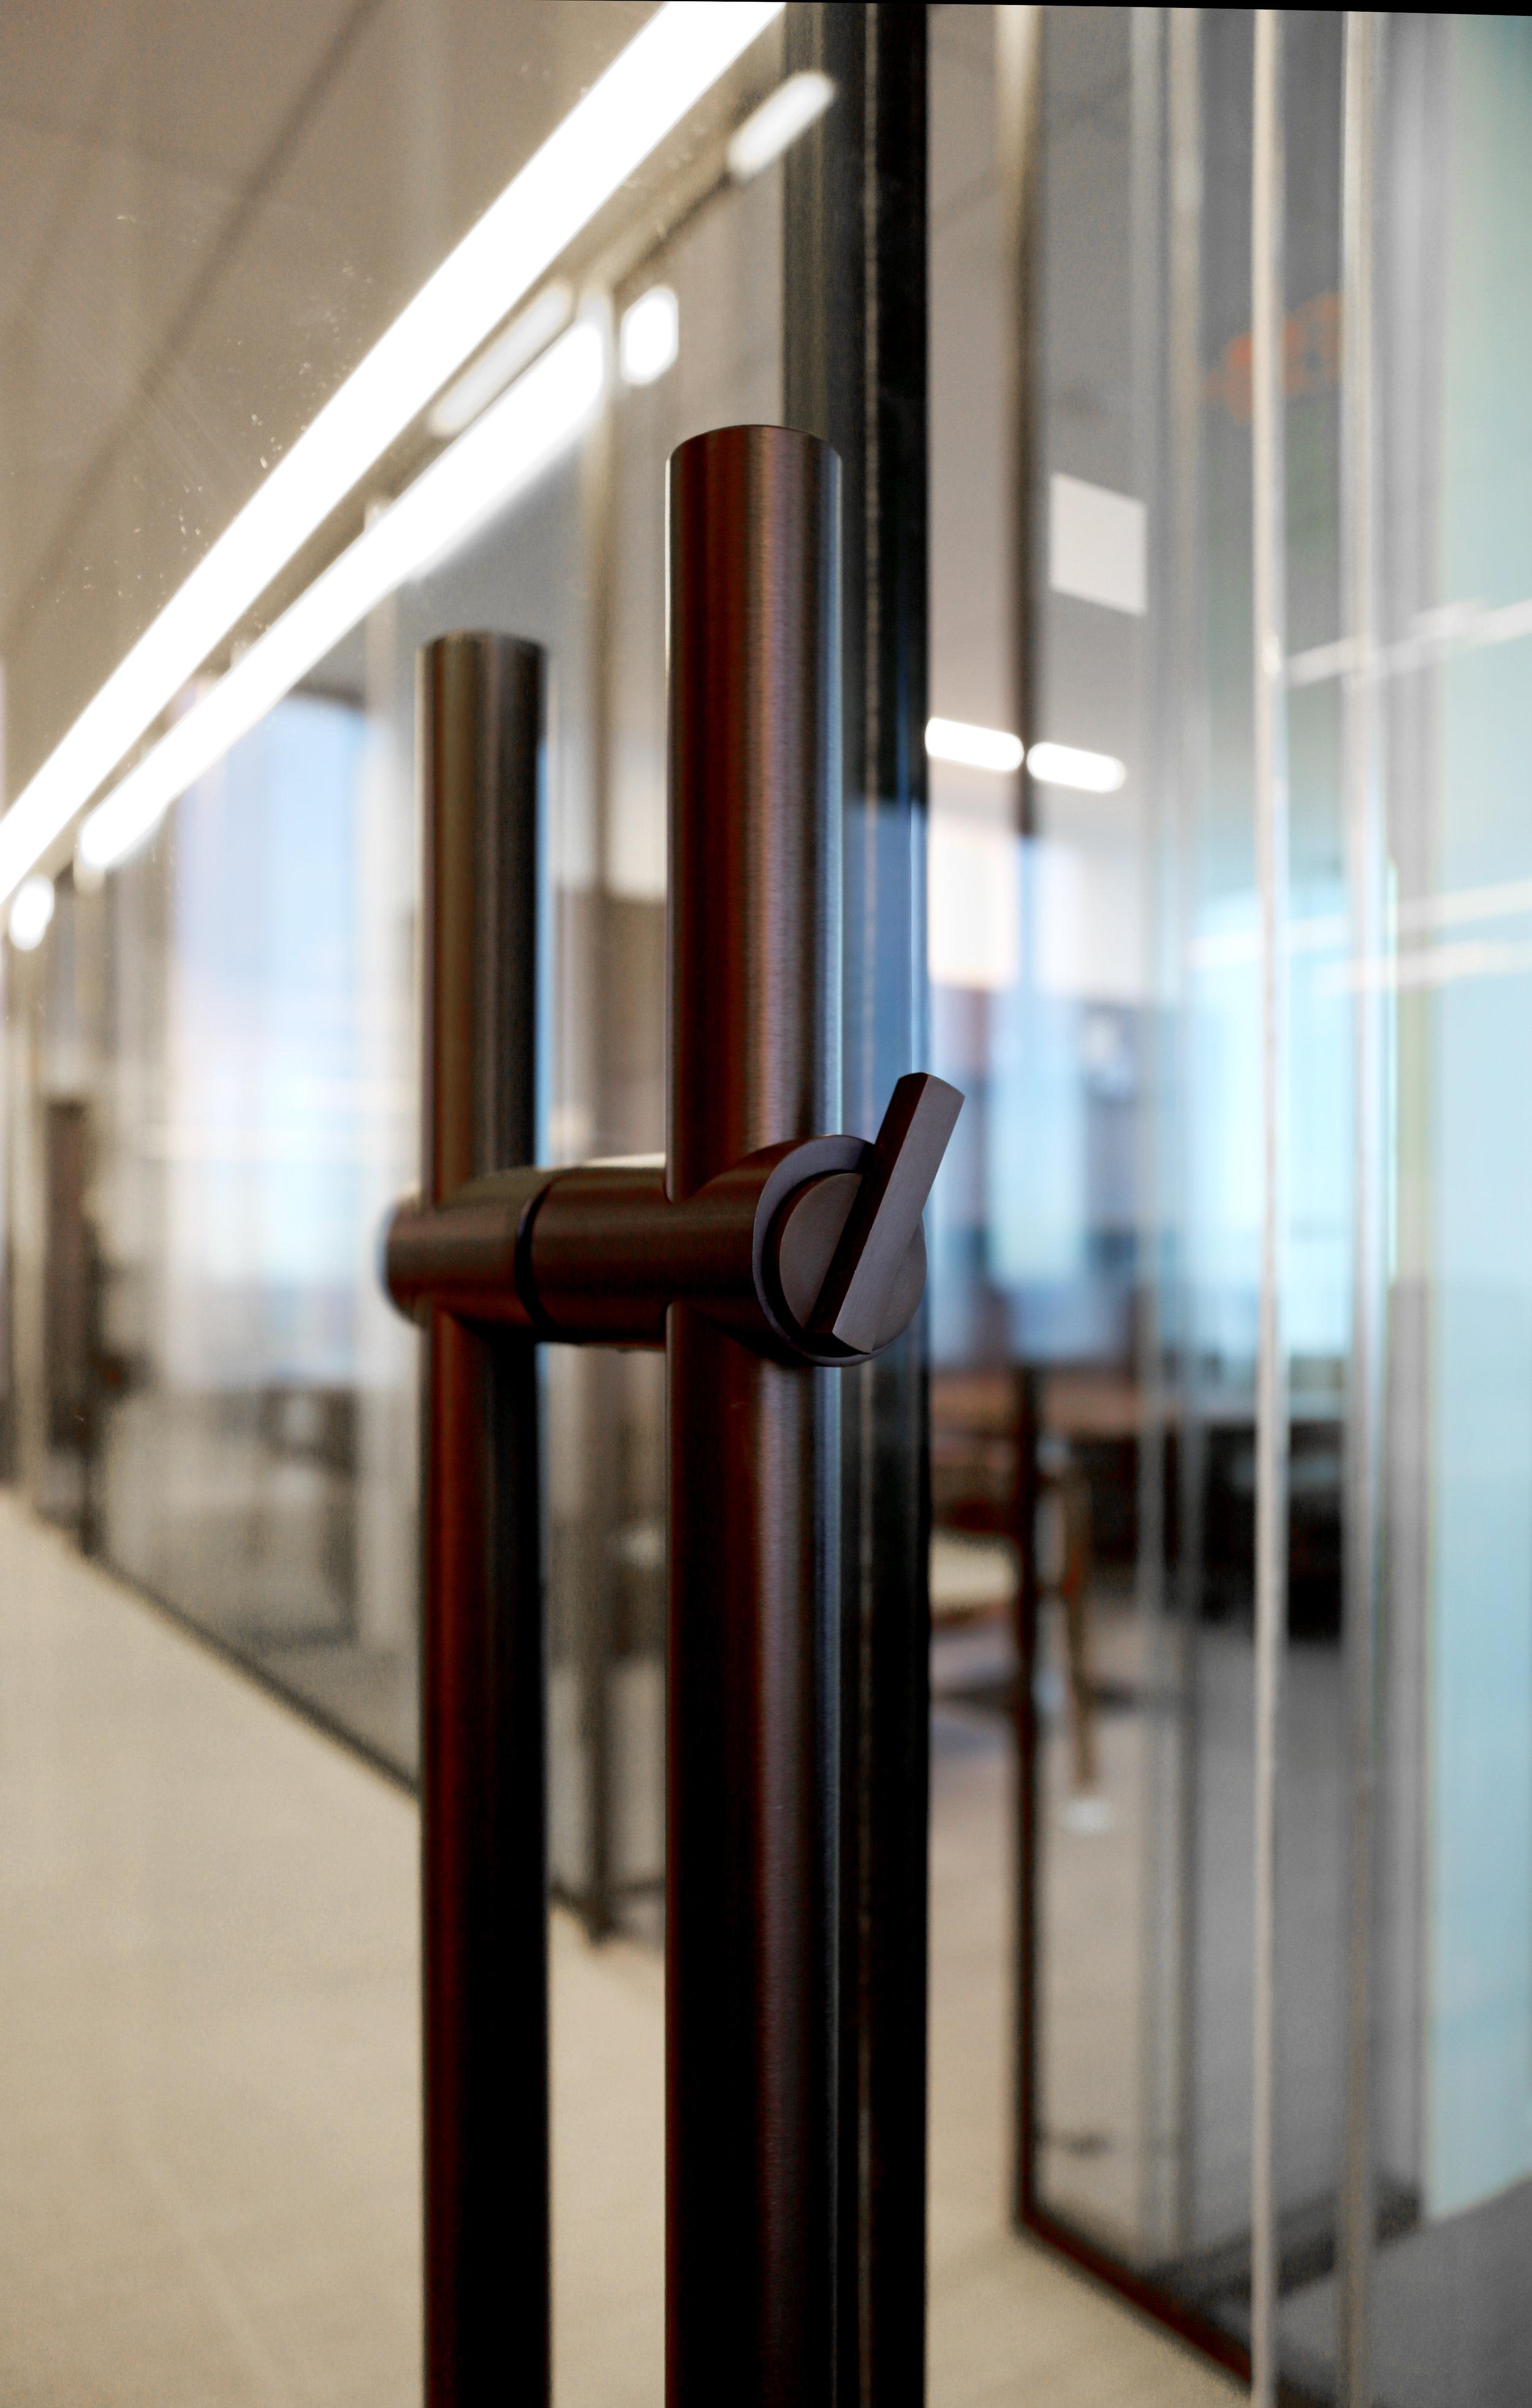 Modernus Dark Anodized Locking Ladder Pull ADA Thumb Turn - Spaceworks AI.jpg